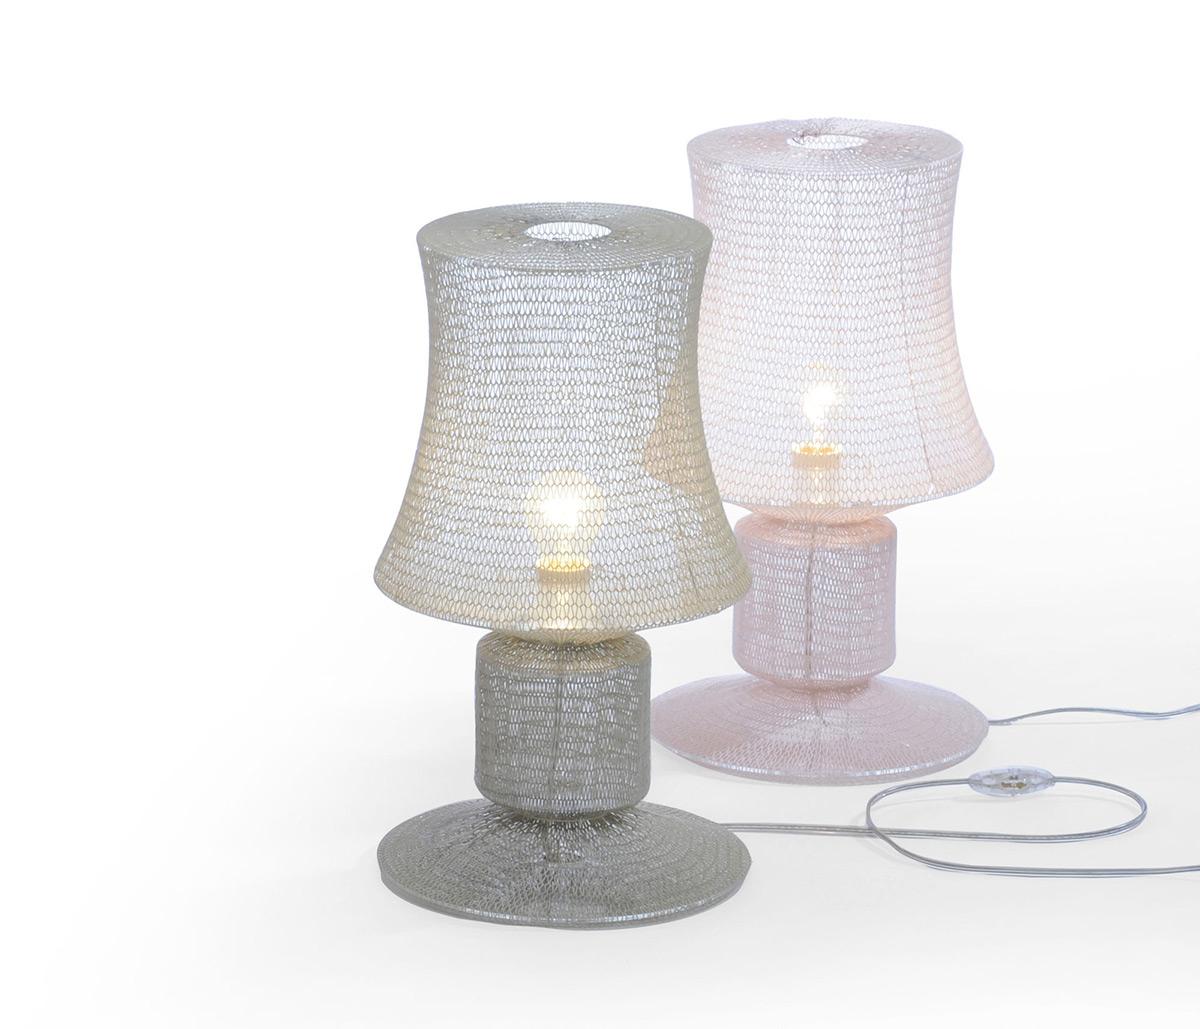 Knitted-Lamp-Meike-Harde-03